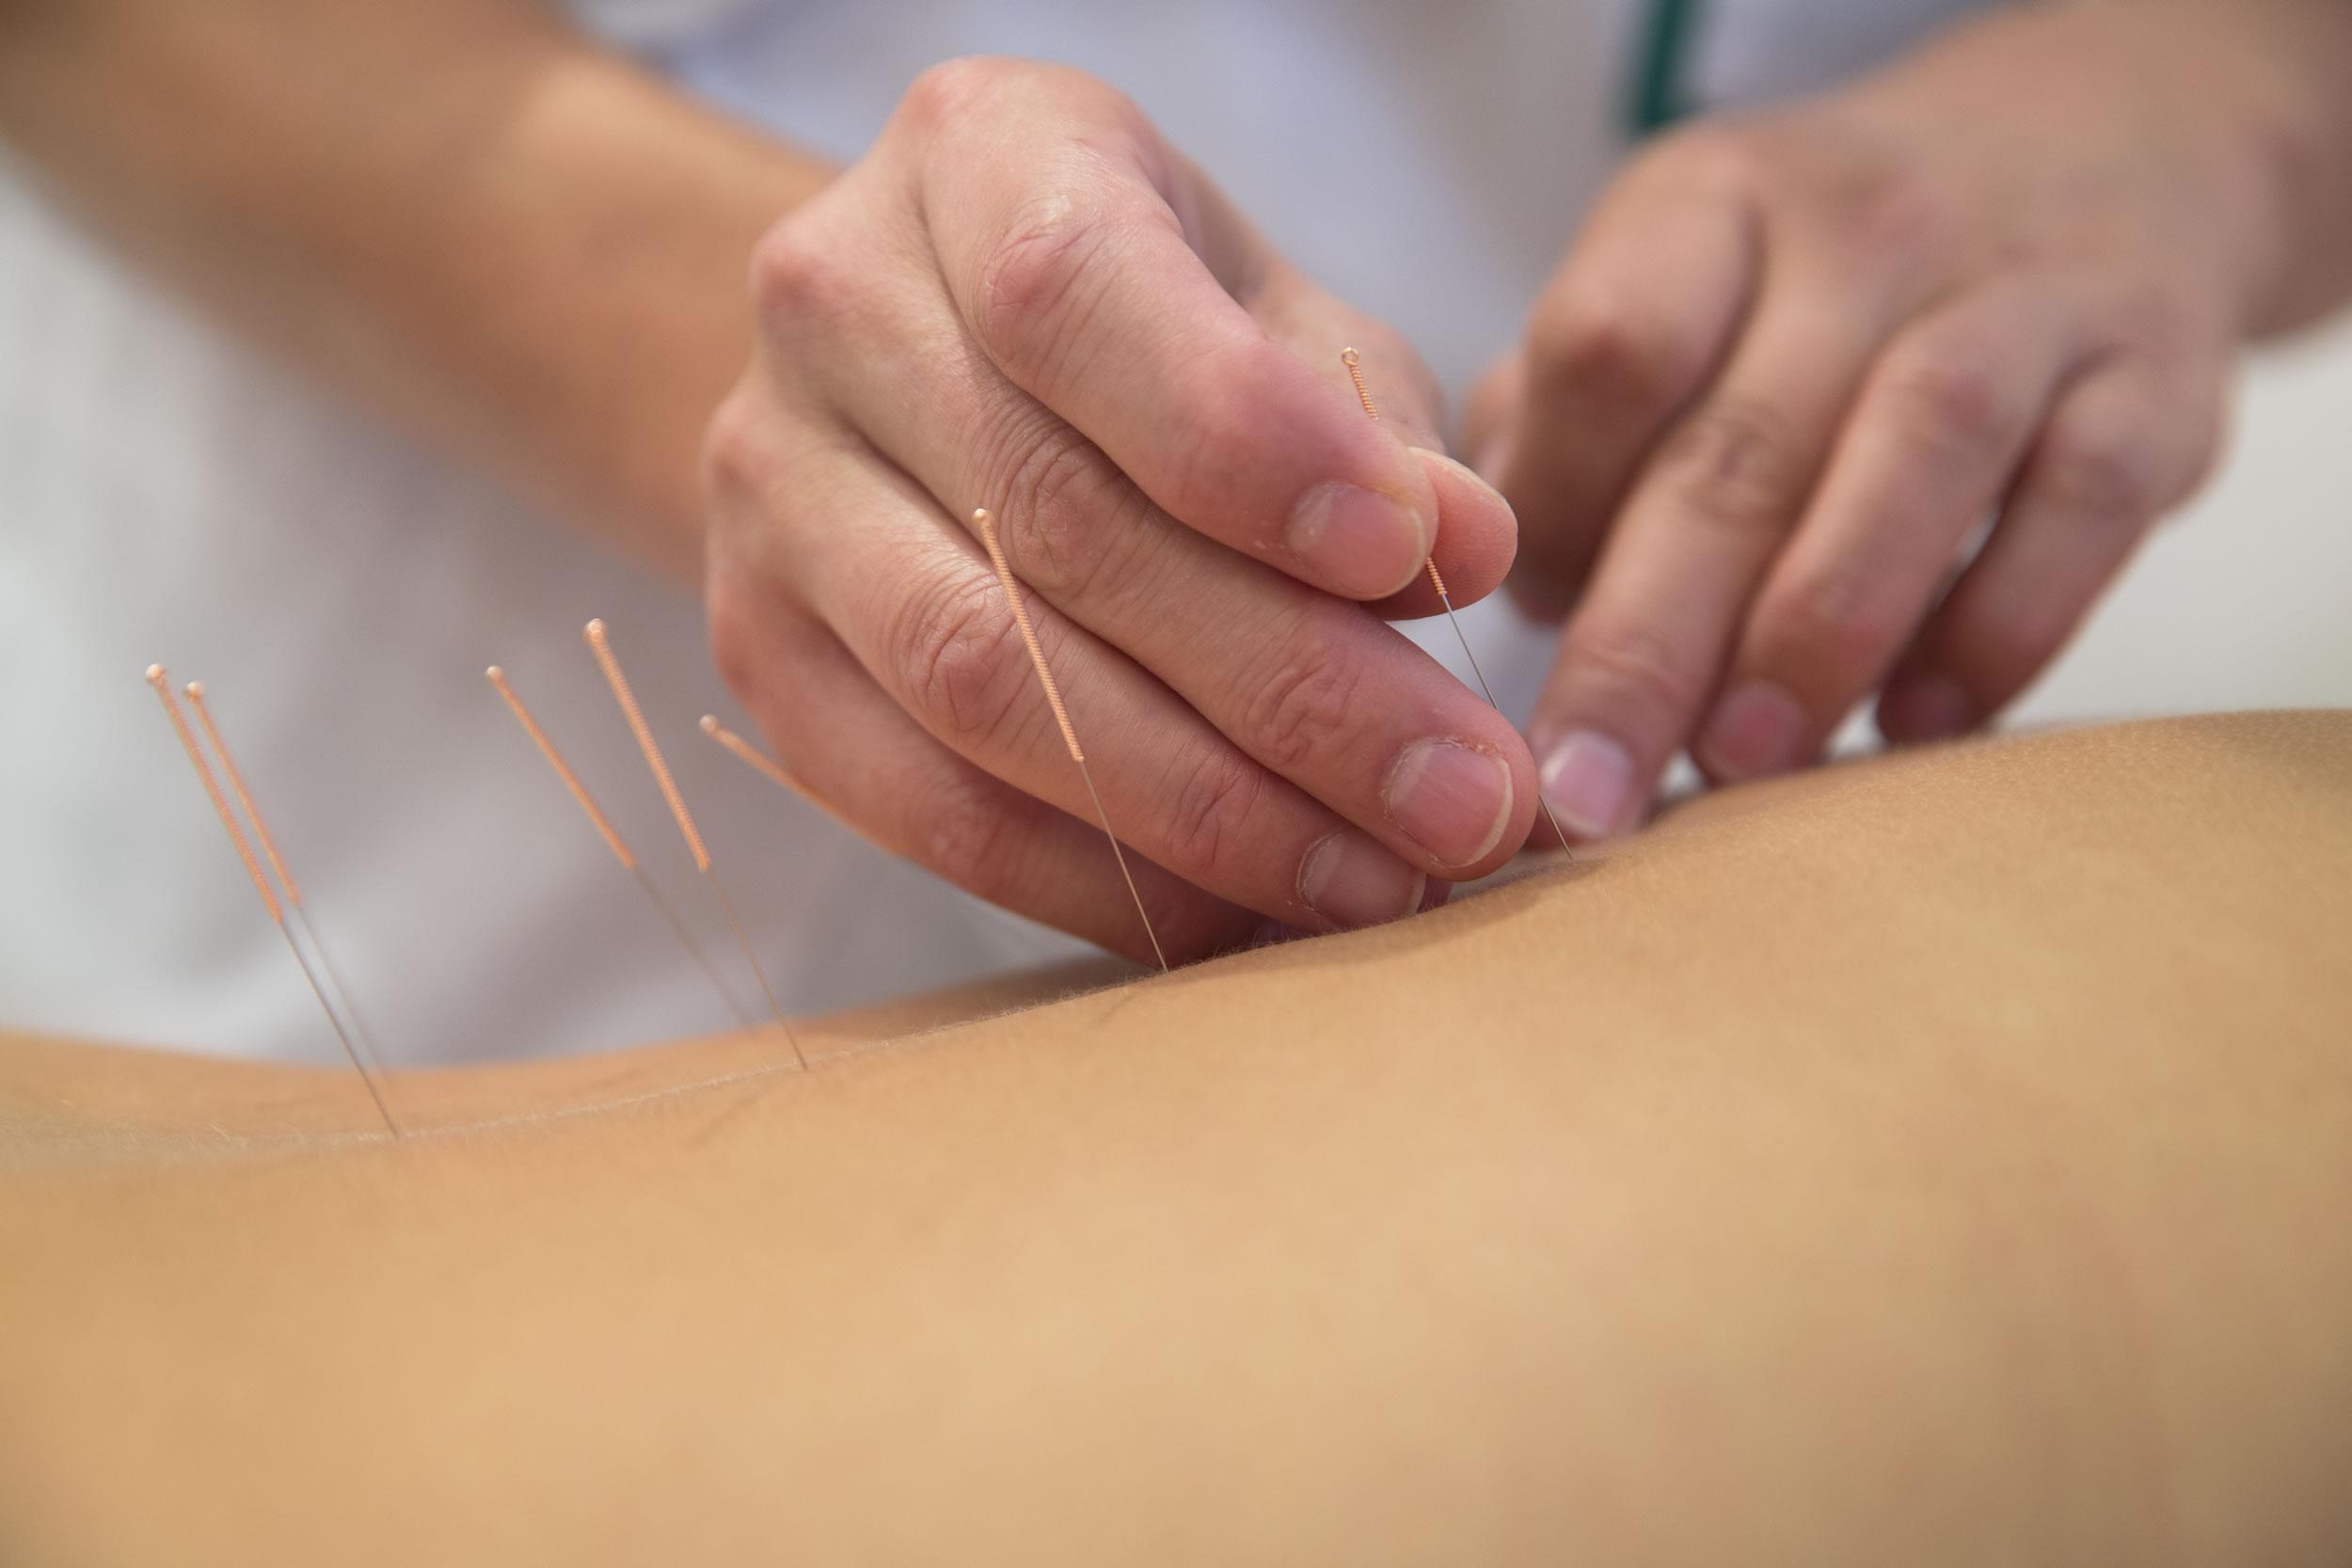 acupuncture for headaches Harrogate